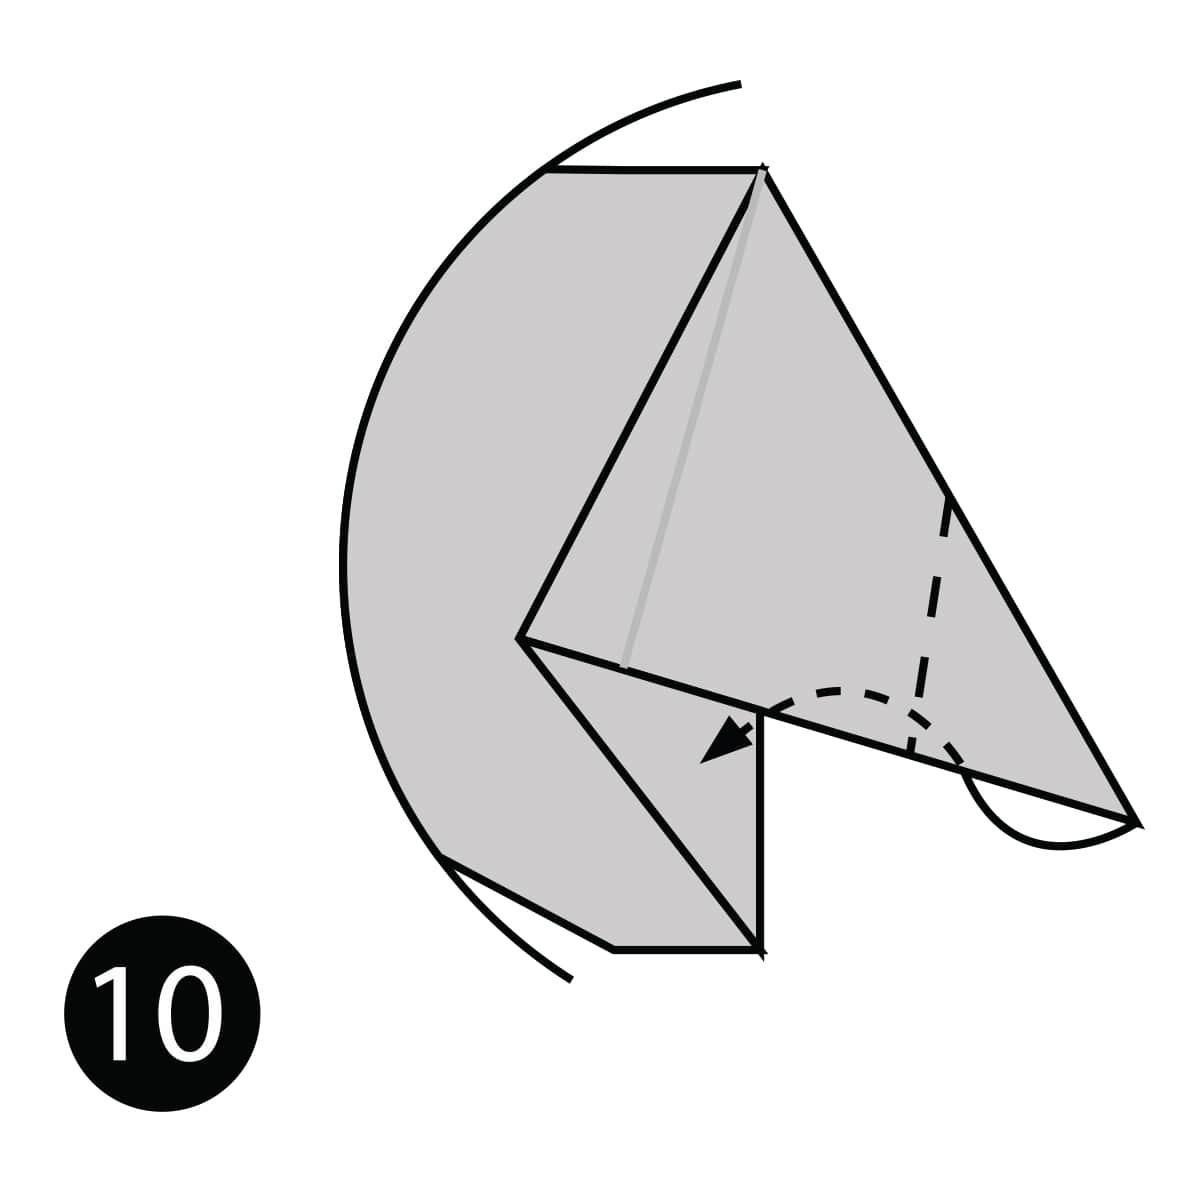 Rhino Step 10